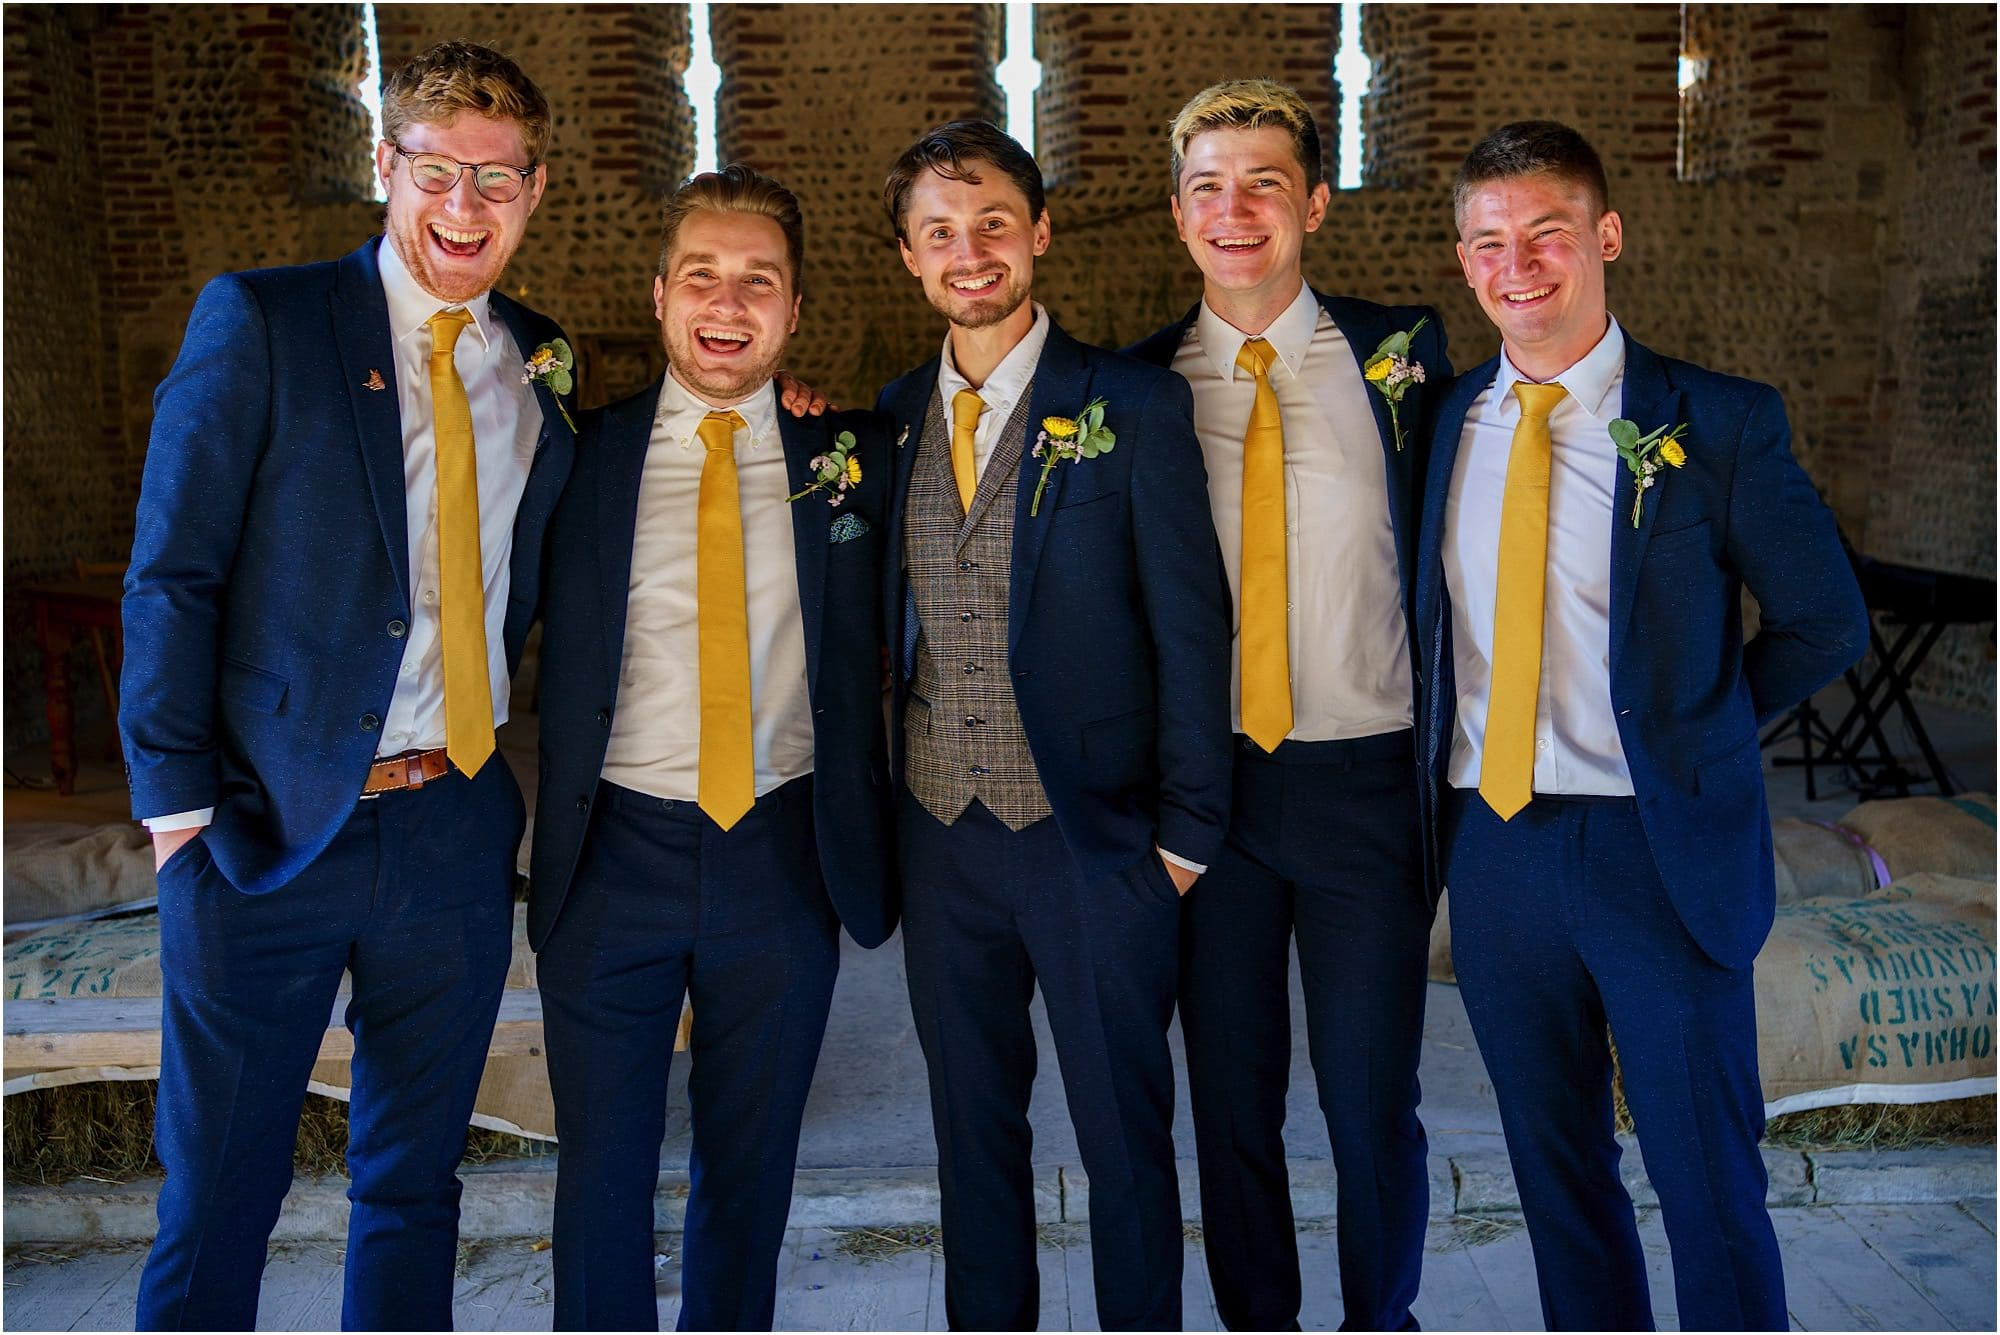 groomsman group shot in the barn